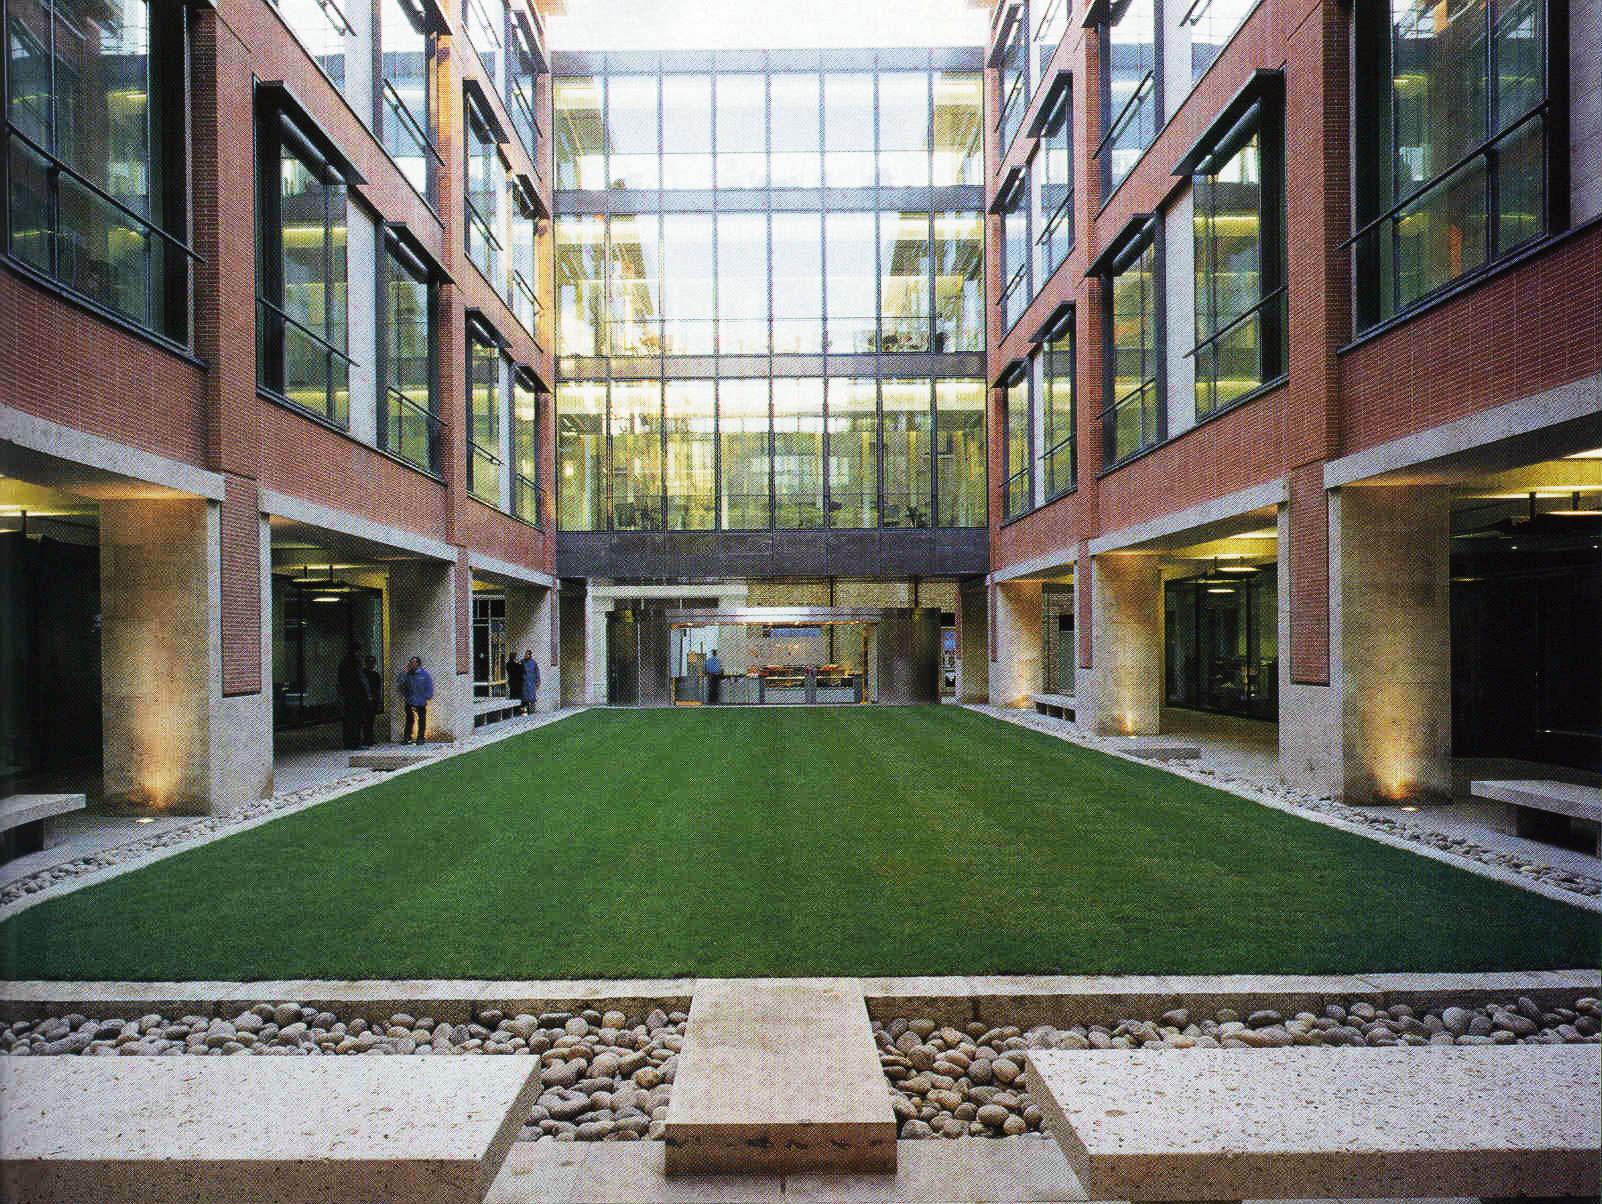 Aтриум лондонского офиса Merrill Lynch